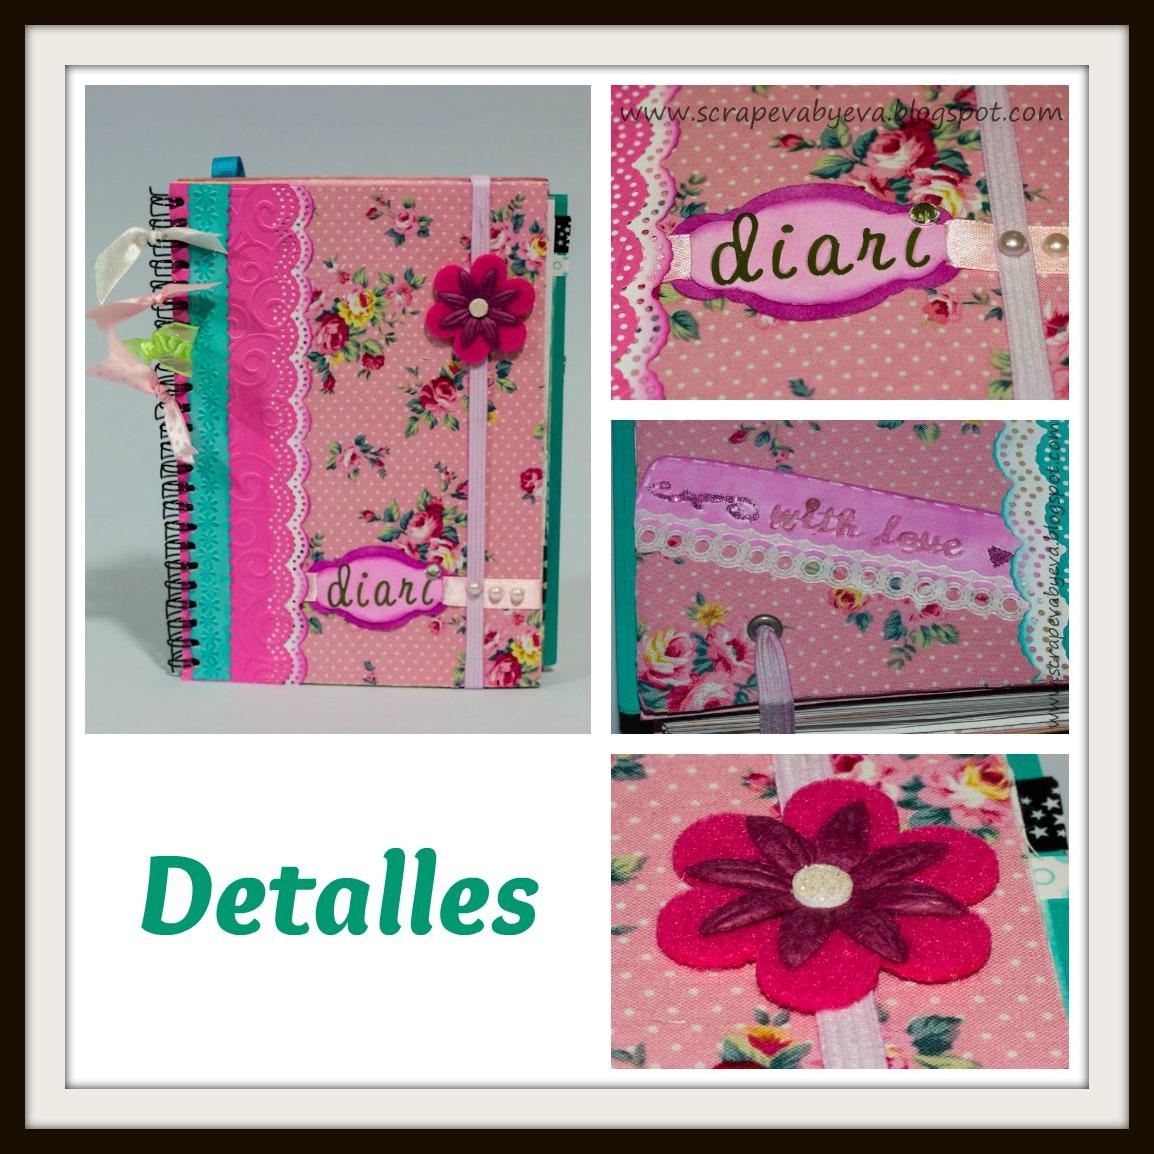 Scrapeva by eva diario romantico for Paginas decoradas